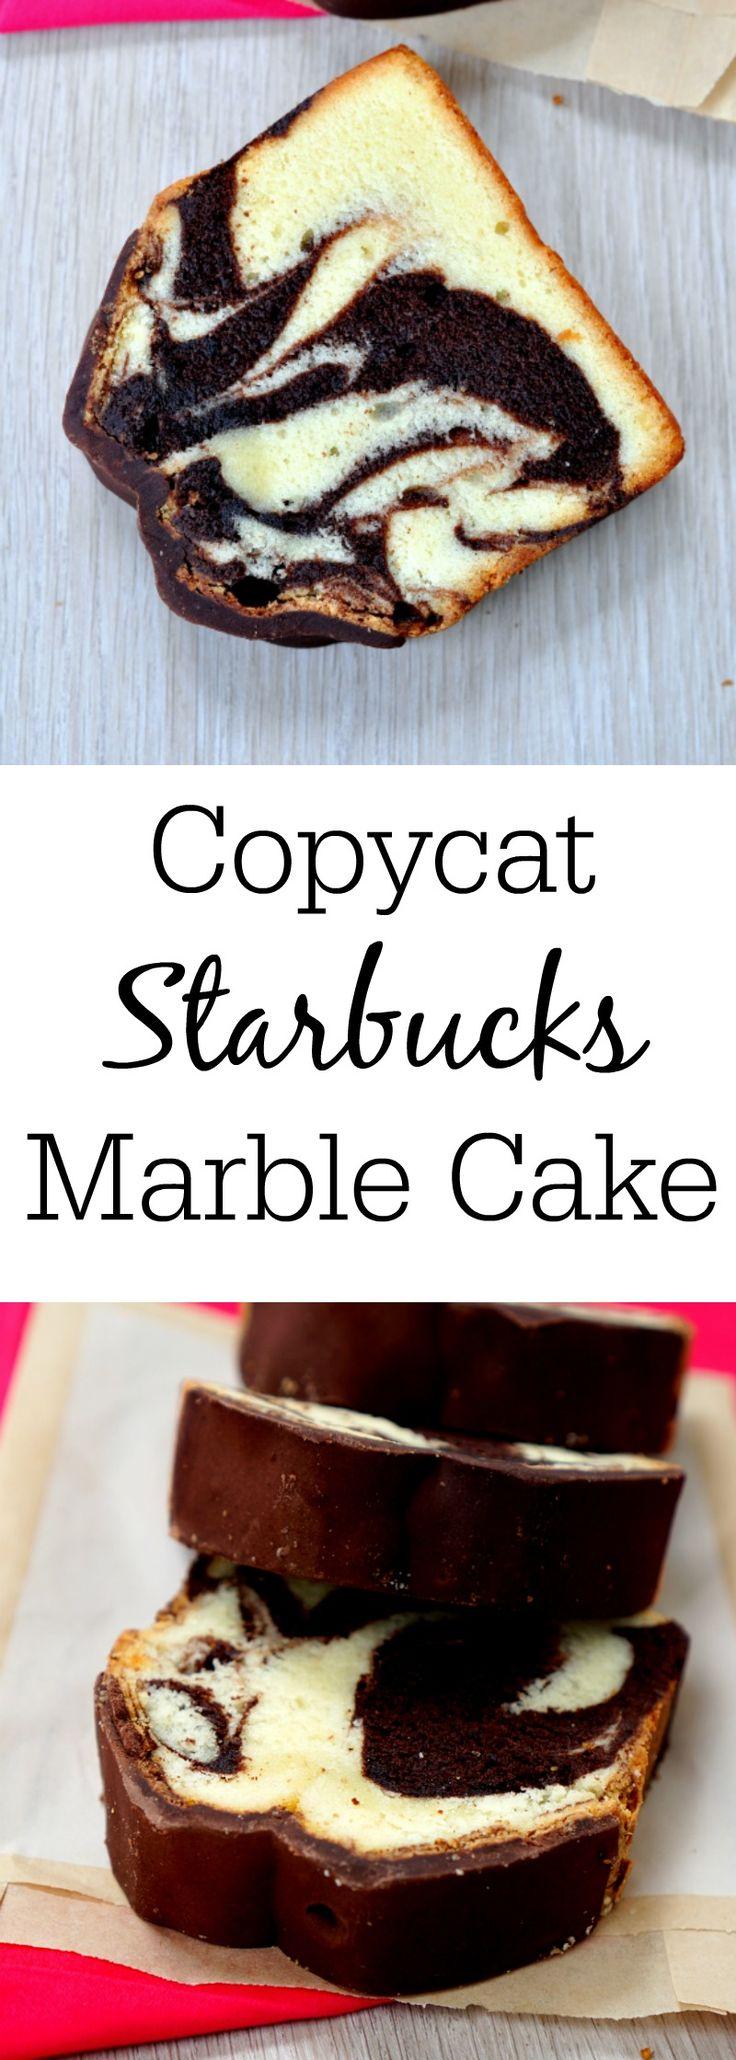 Copycat Marble Pound Cake                                                                                                                                                                                 More